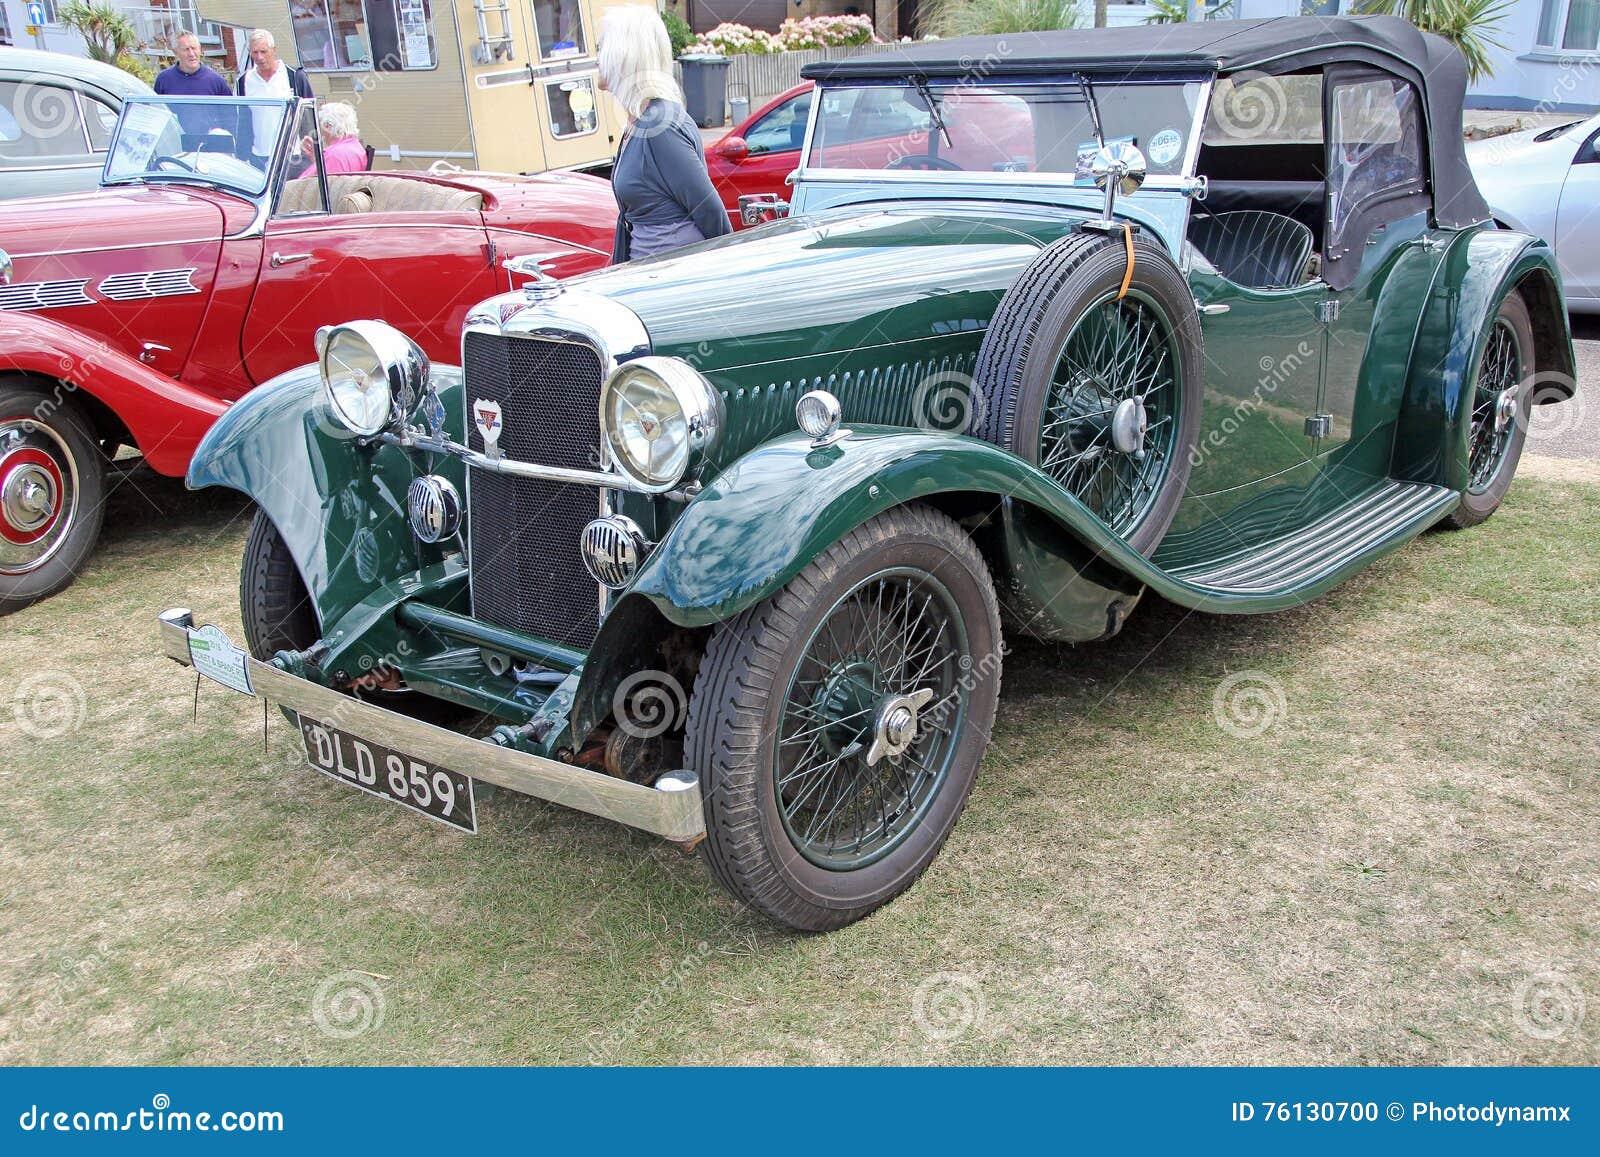 Vintage Classic British Alvis Editorial Image Image Of Classic - Ideal classic cars car show